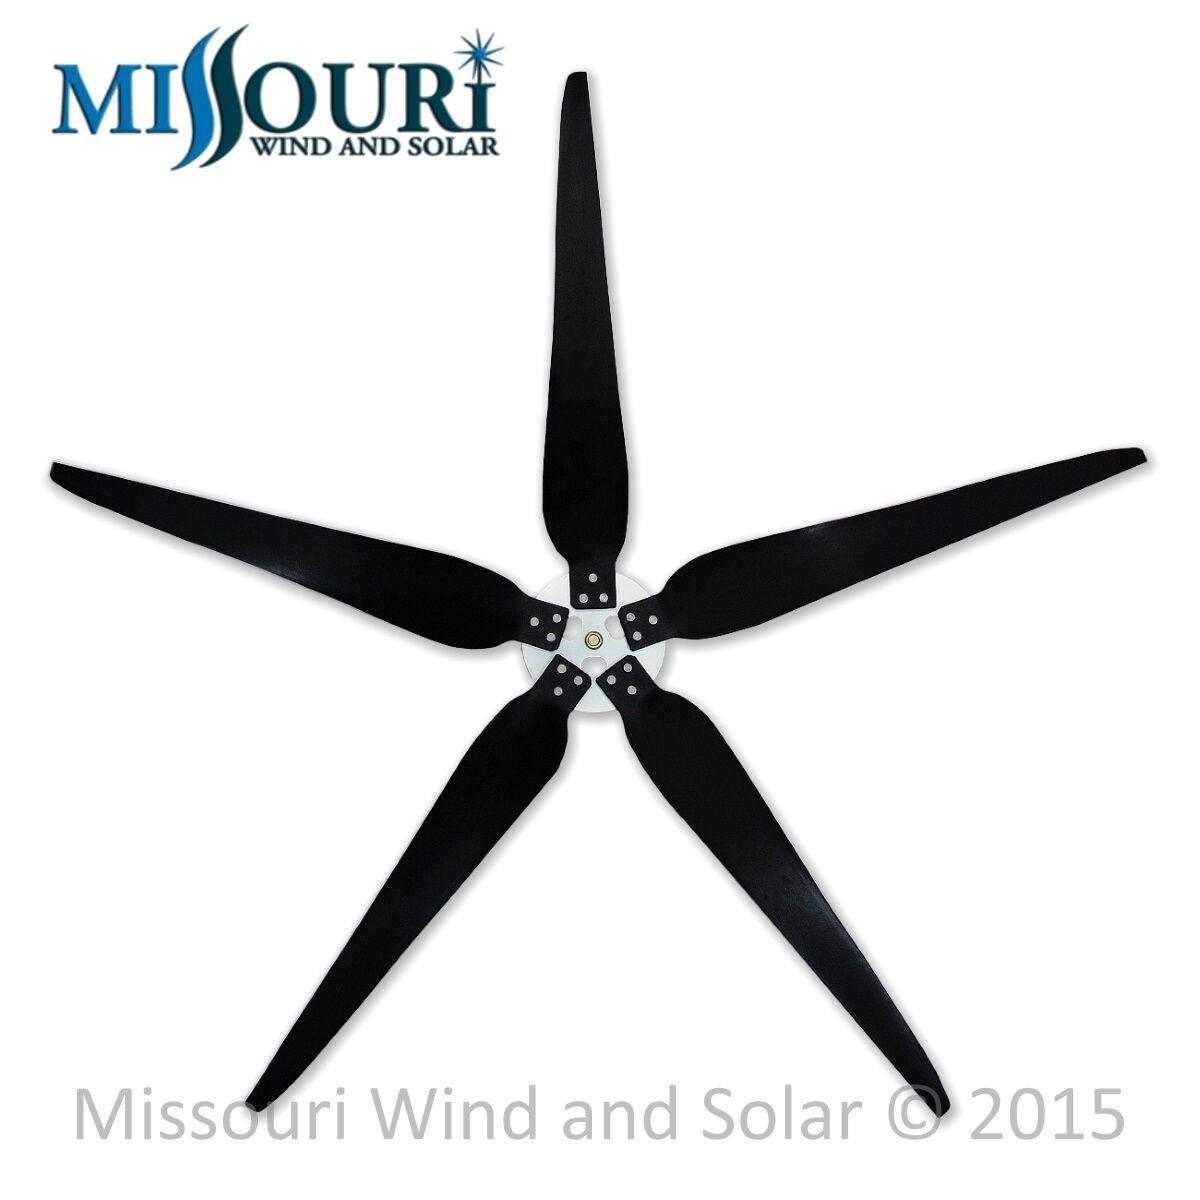 5 Raptor Generation 5™ 38 Inch Blades and Hub for Wind Turbine Generators